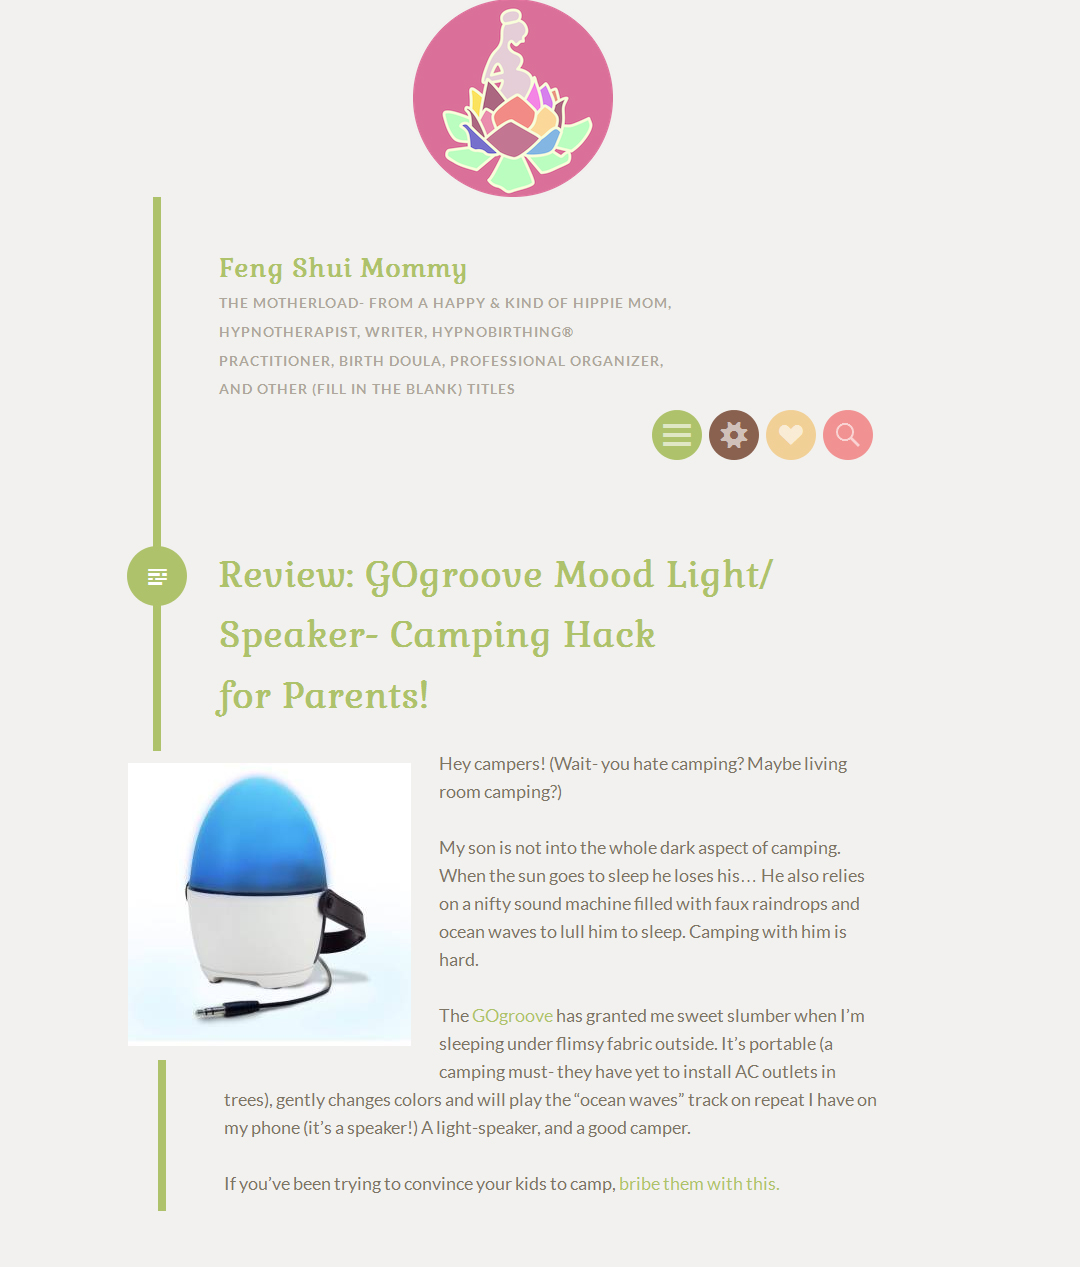 GOgroove Mood Light/ Speaker- Camping Hack for Parents!